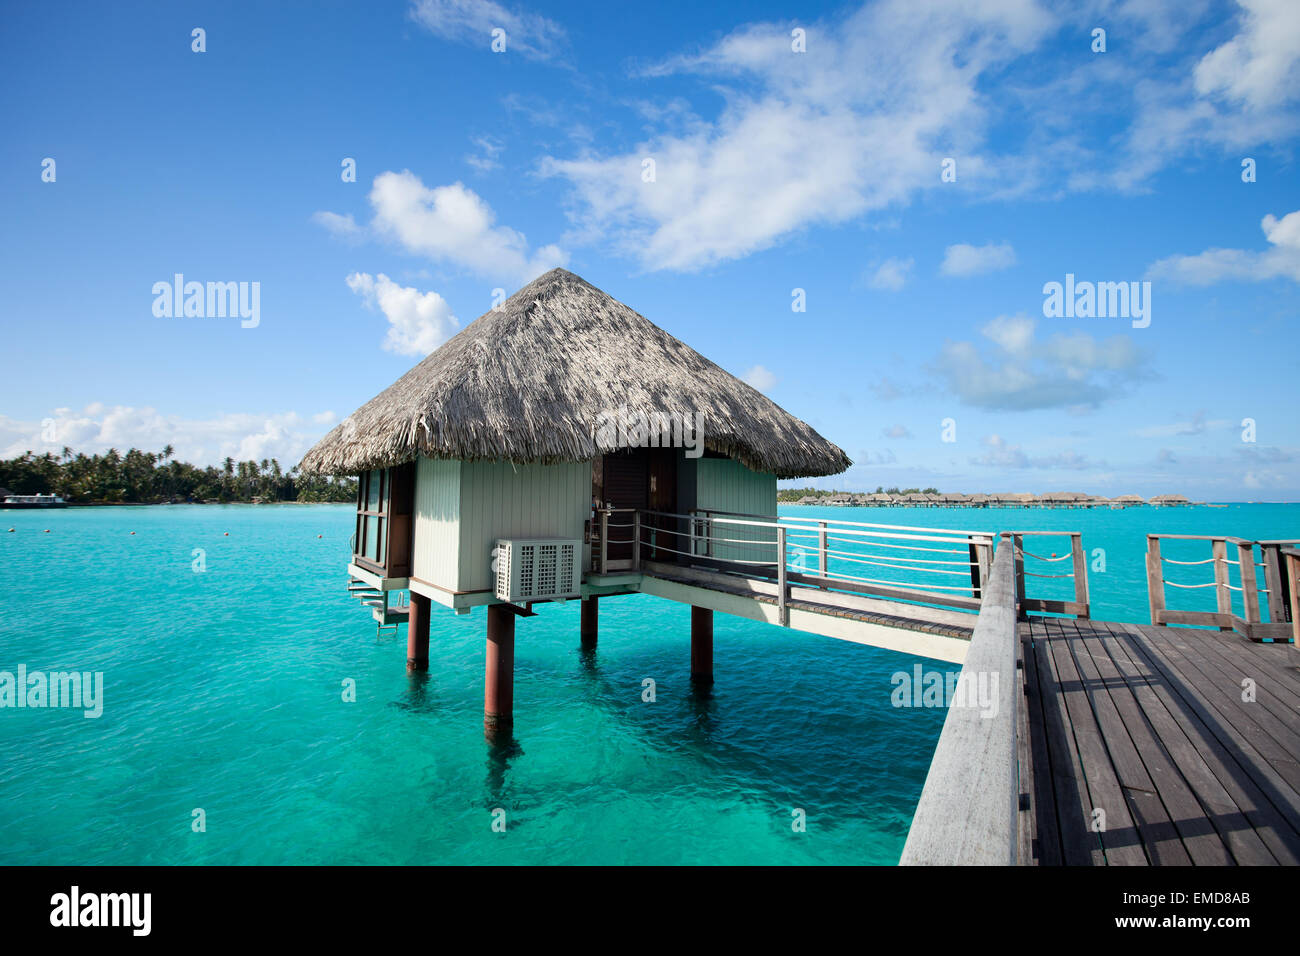 Overwater bungalow - Stock Image